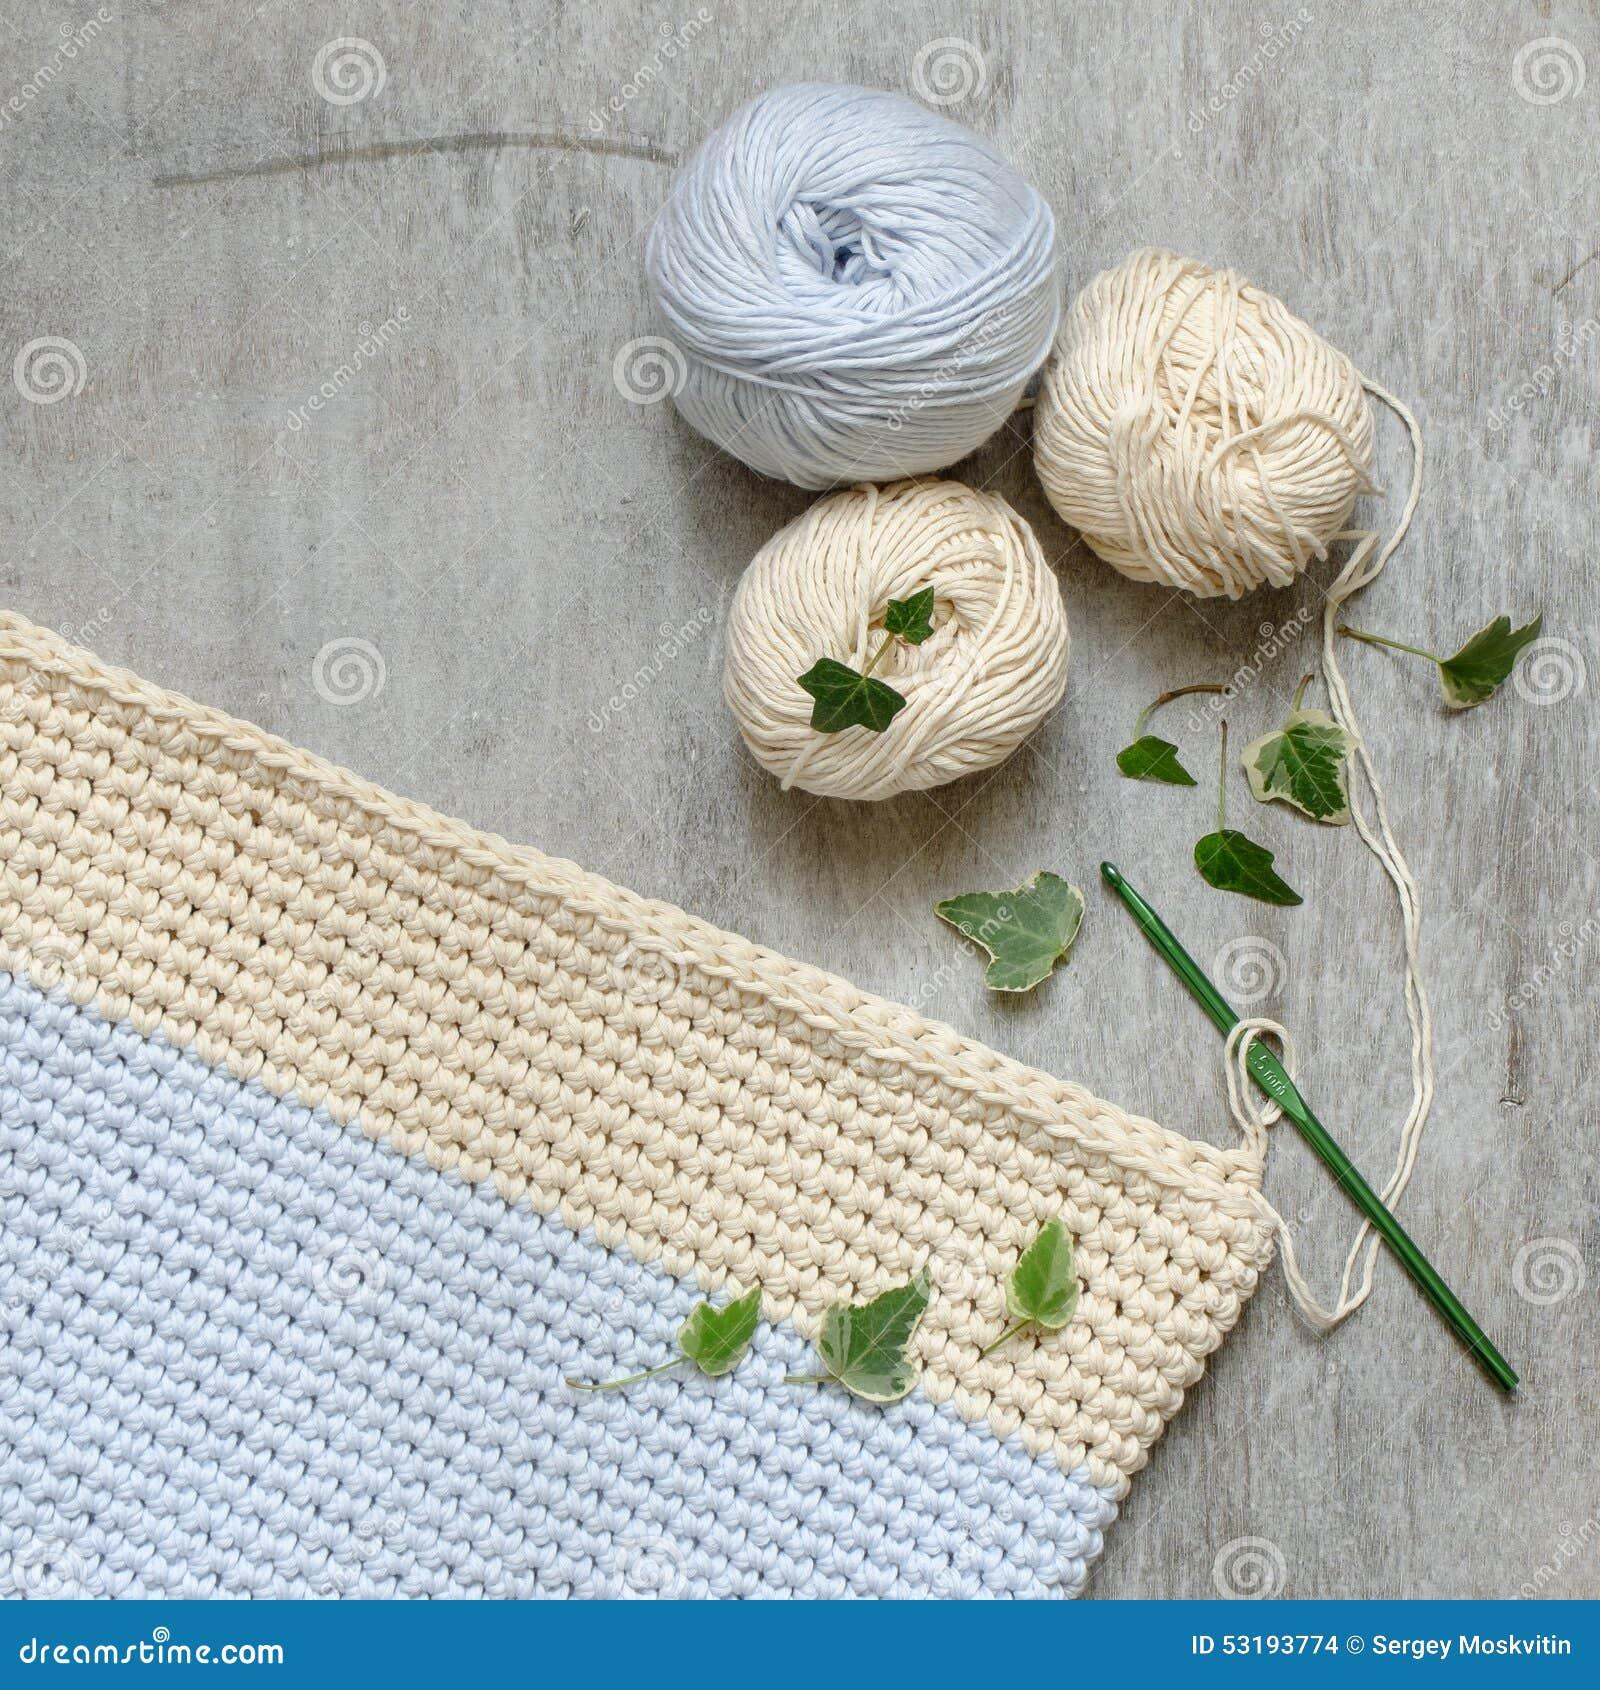 ball of yarn crochet - photo #32